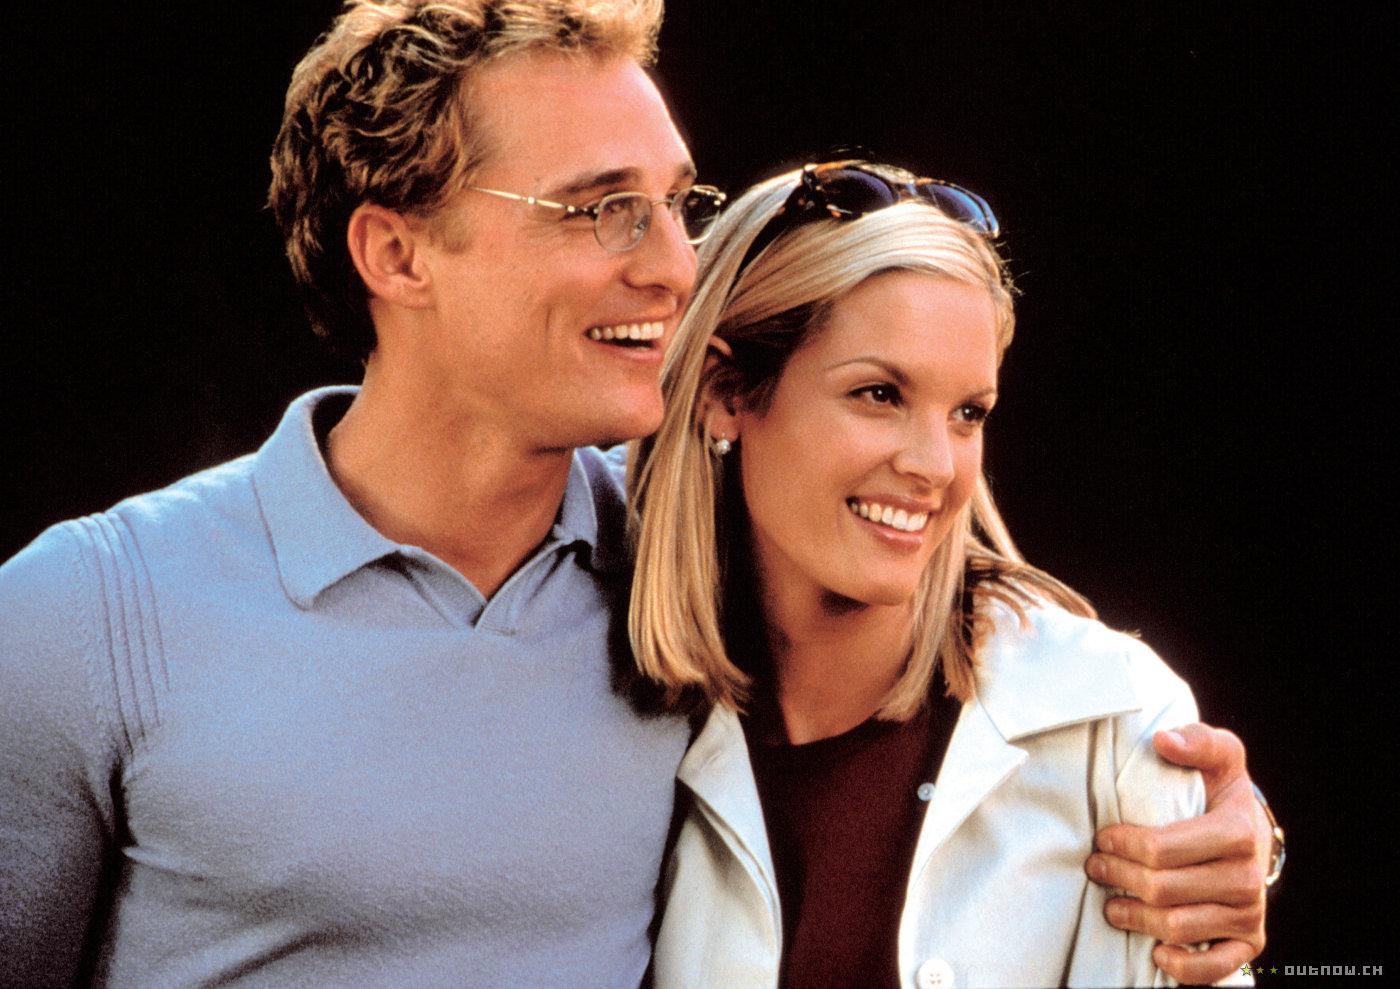 FilmSzenenbild  Bilder  The Wedding Planner 2001